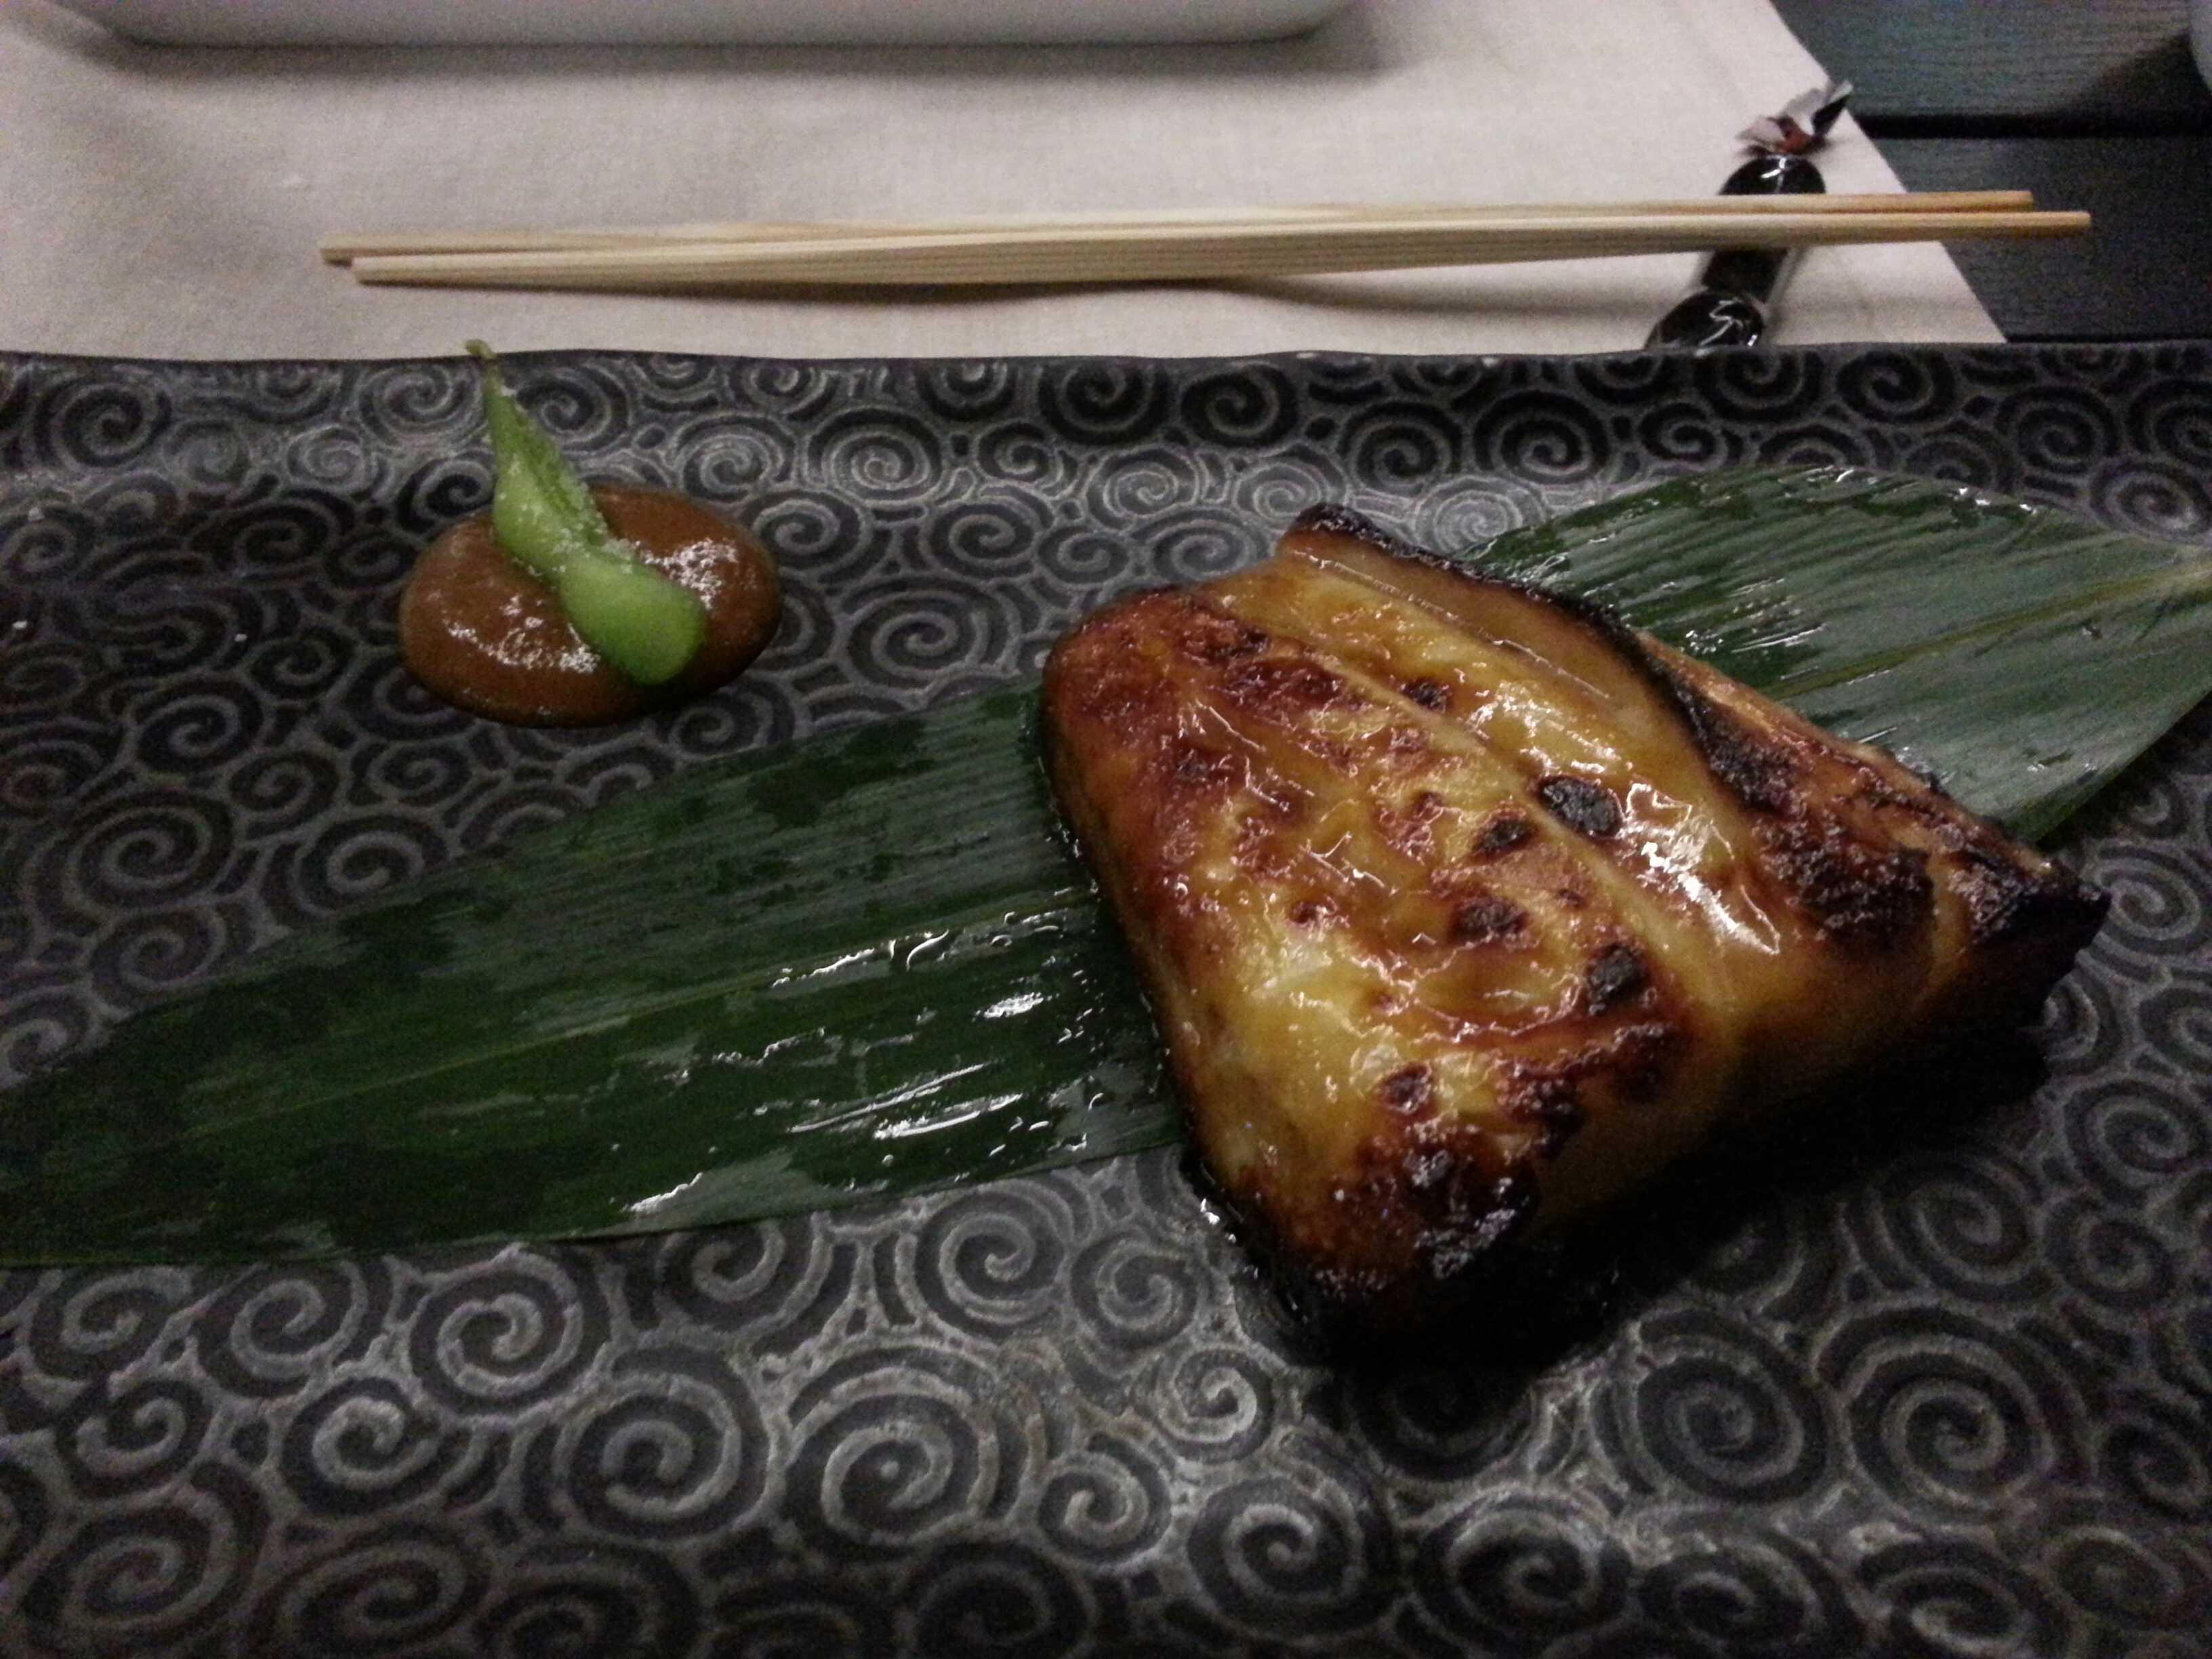 Restaurante 99 sushi bar - Bacalao Negro